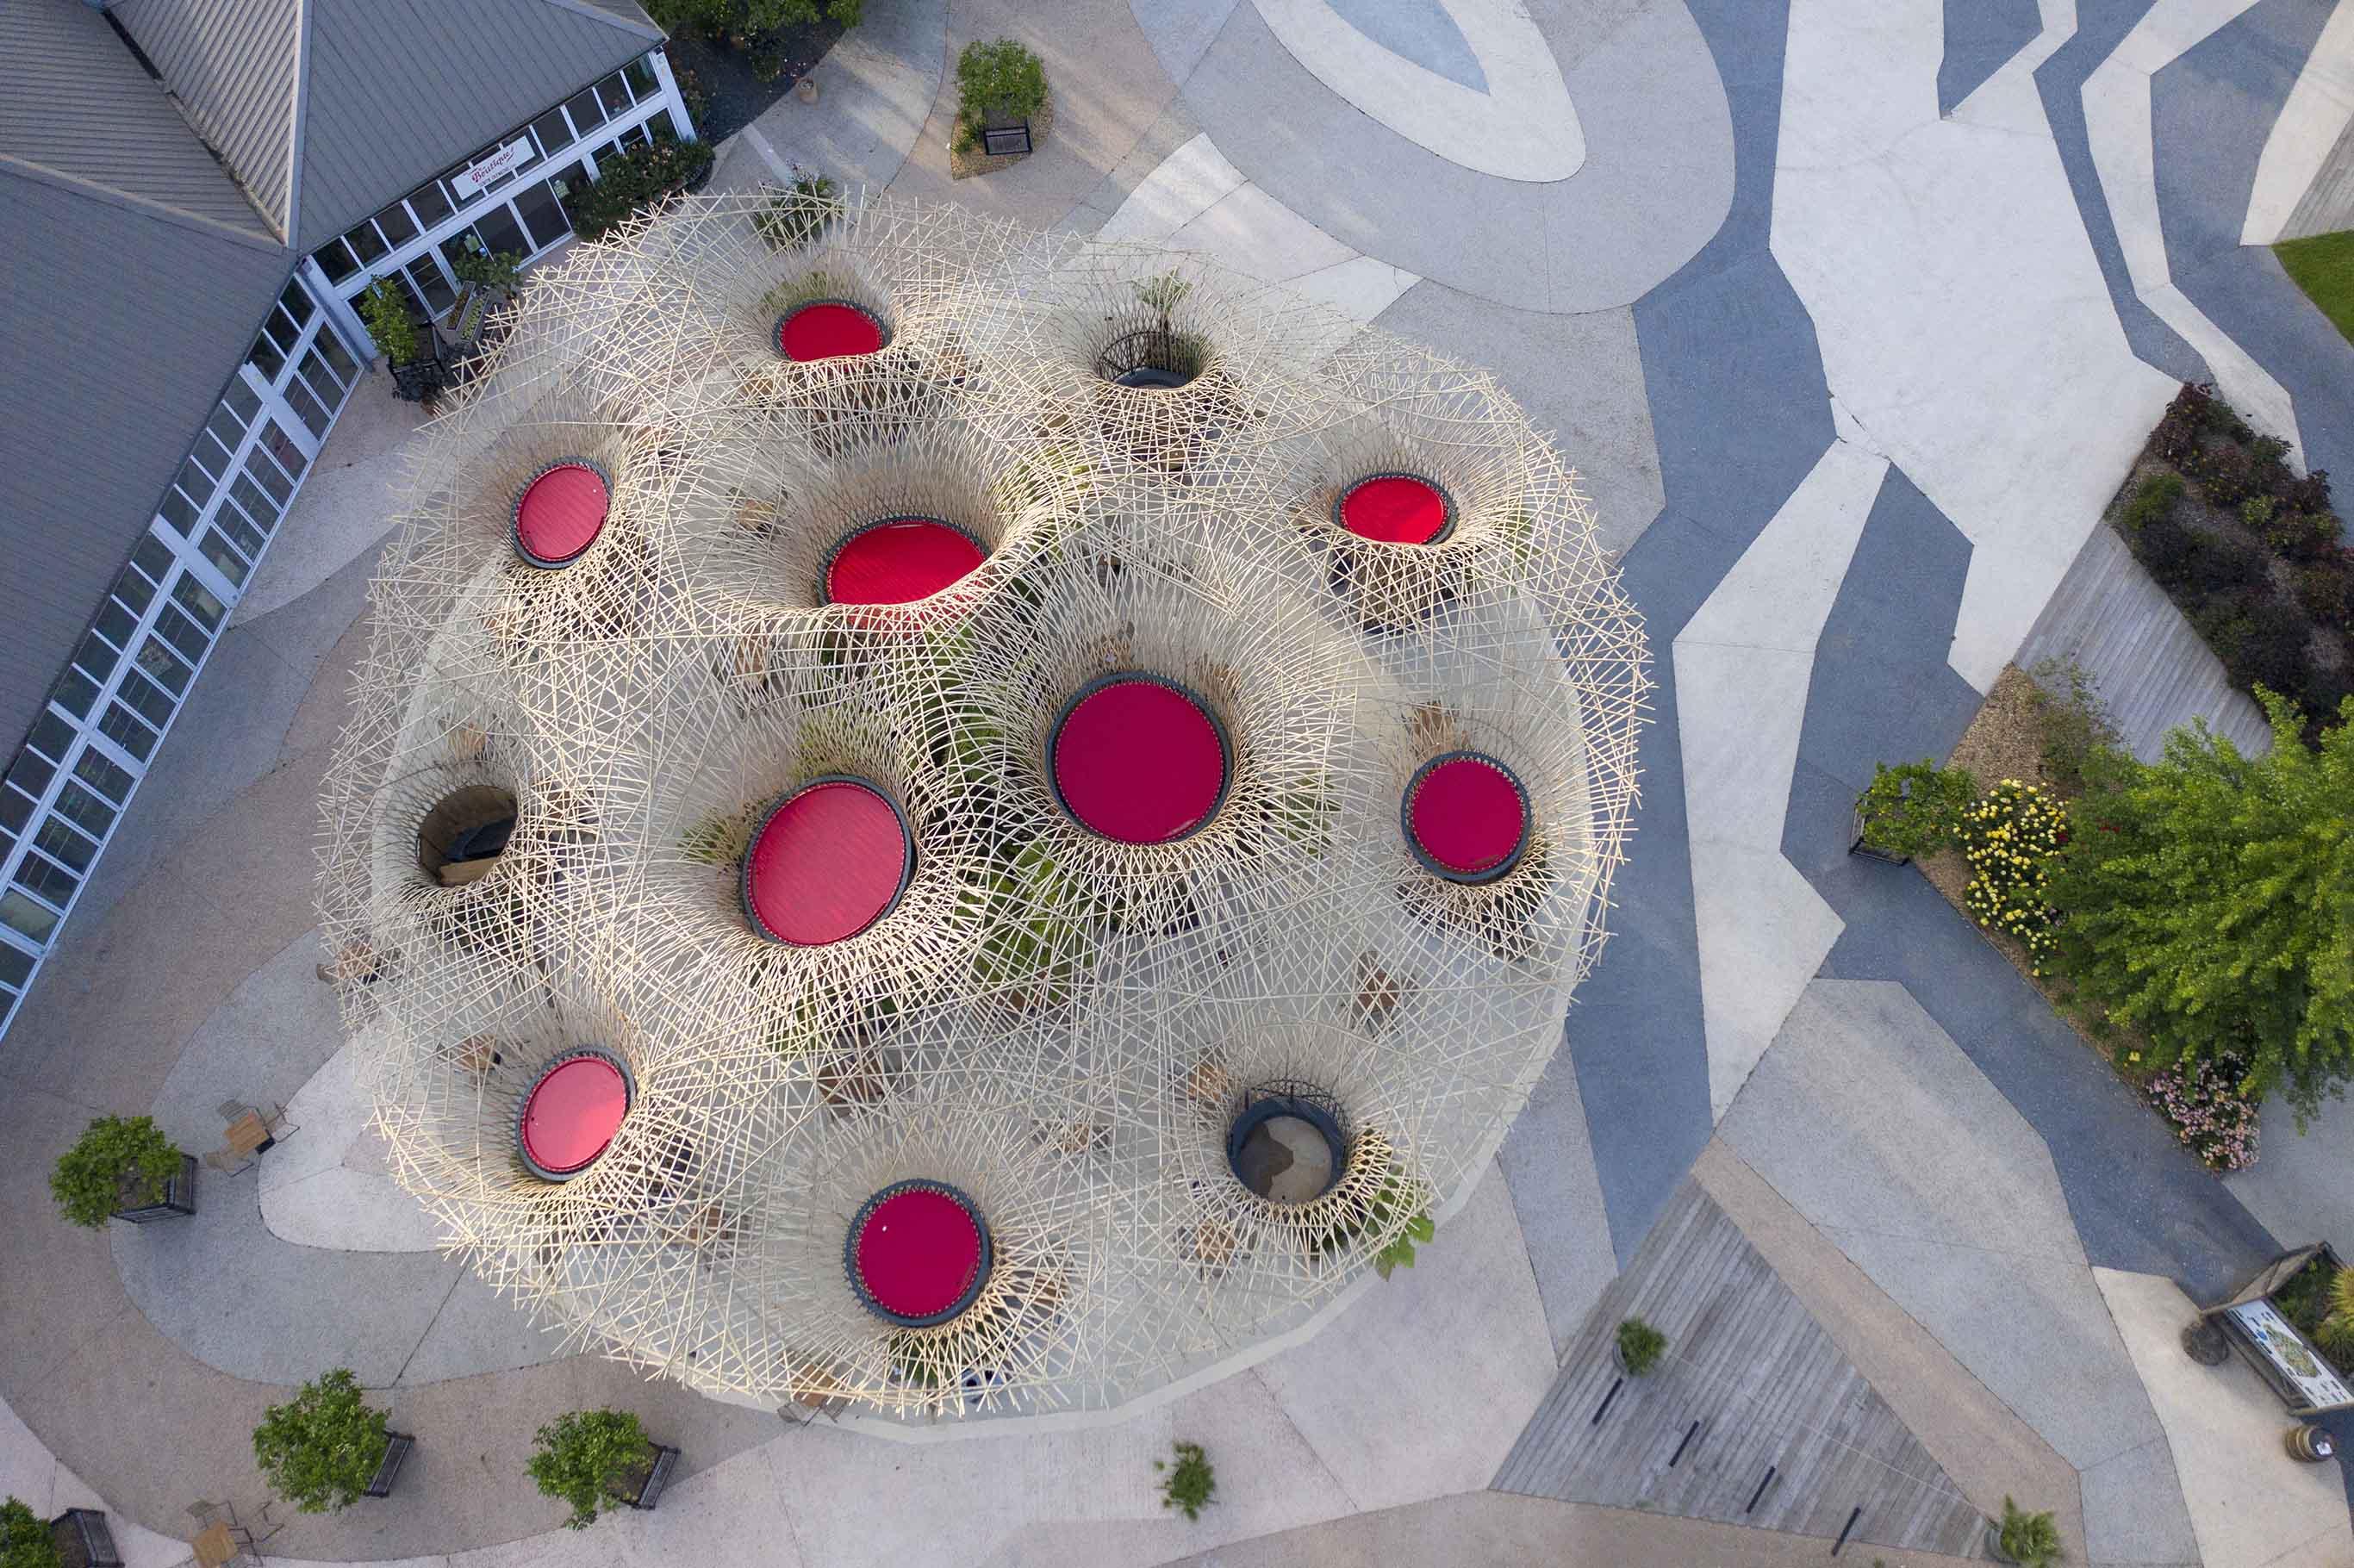 Bambusinstallation aus Bambusgeflecht Deambulons - l'Oasis - Kalice Studio - Arnaud Childeric2